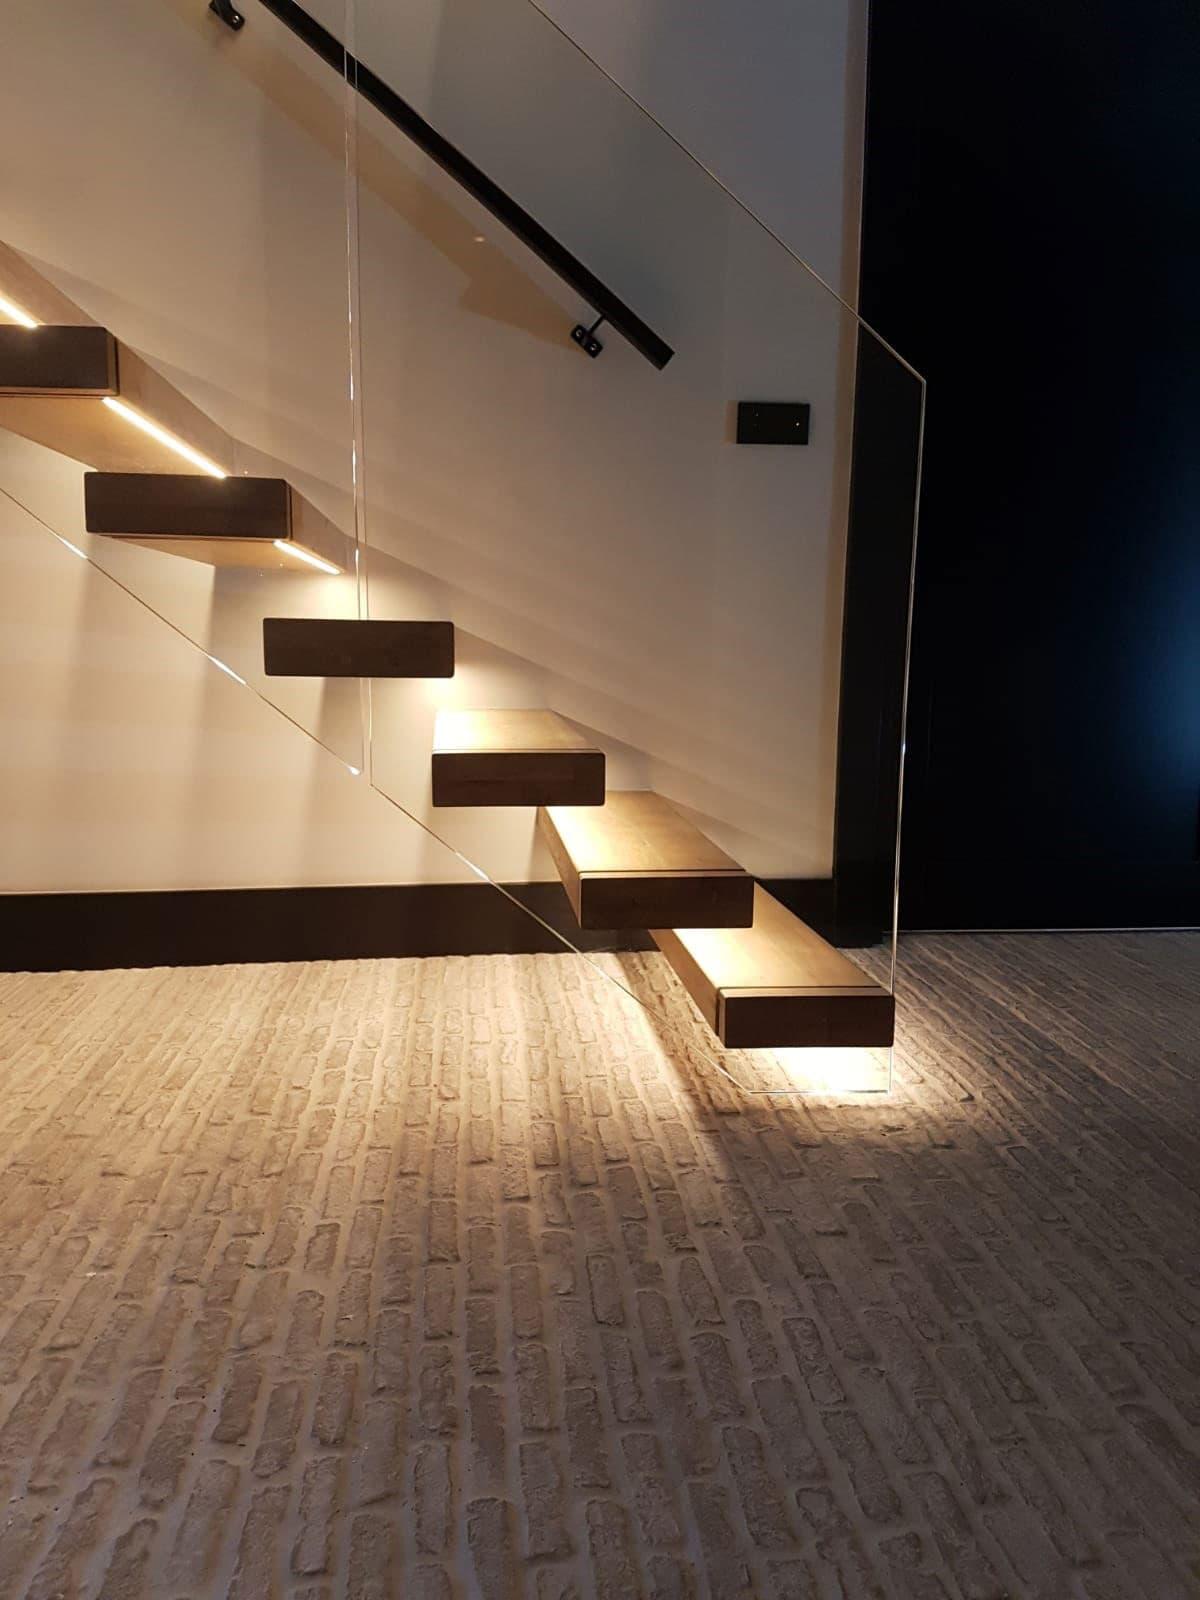 zt26e zwevende trap met ledverlichting